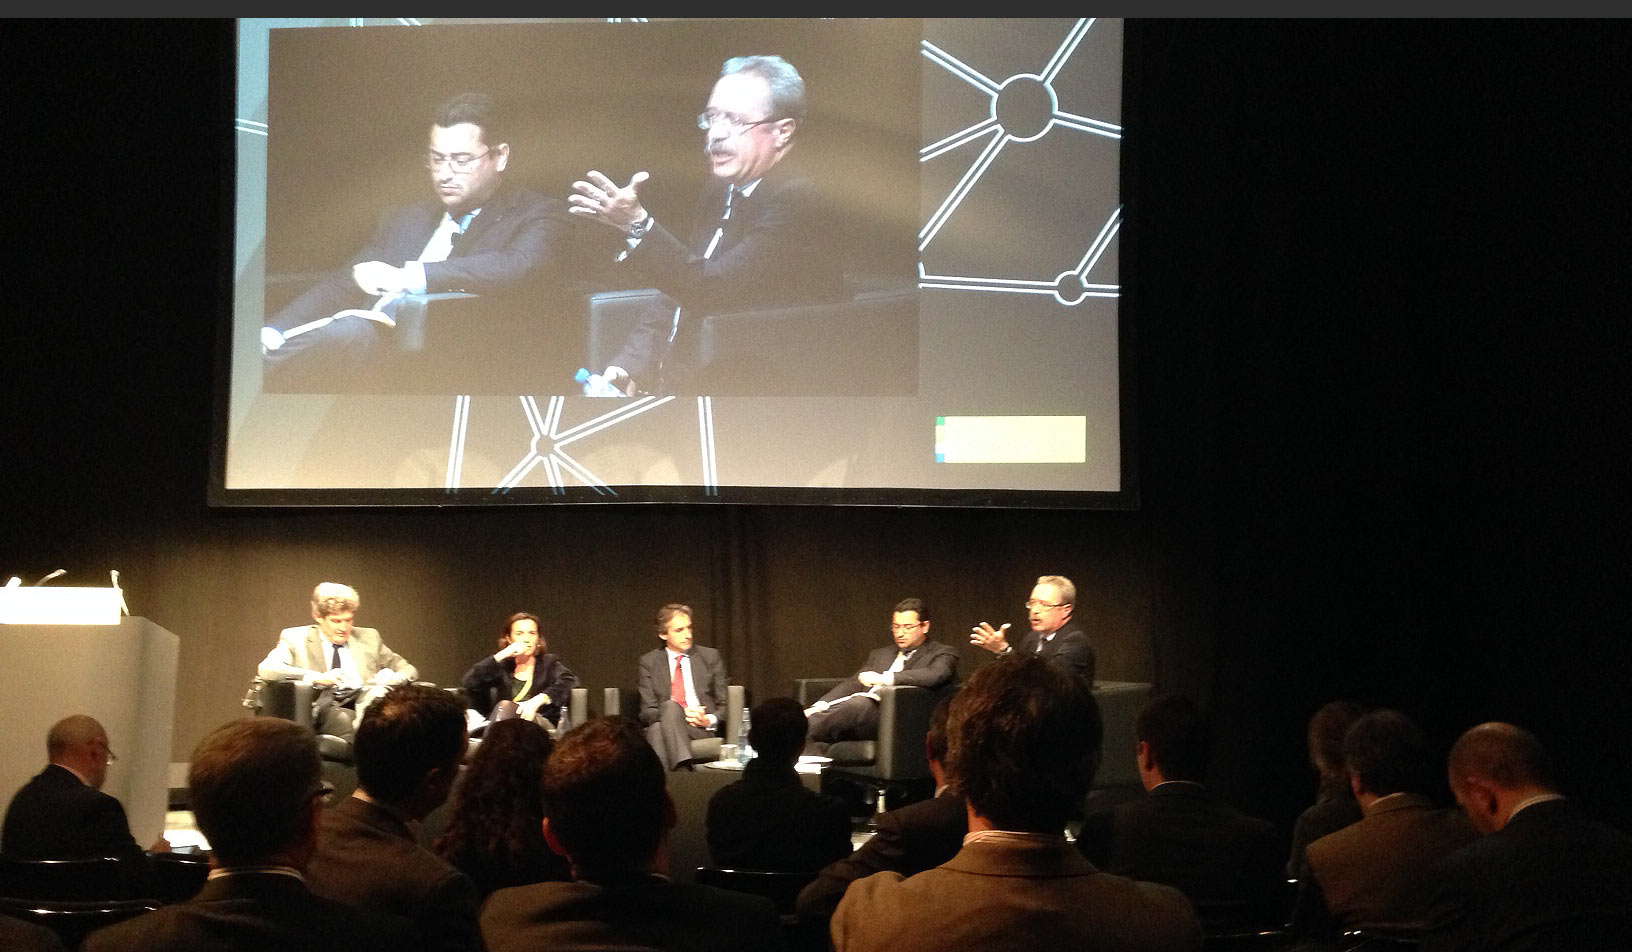 colaboracion-publico-privada-smartcity